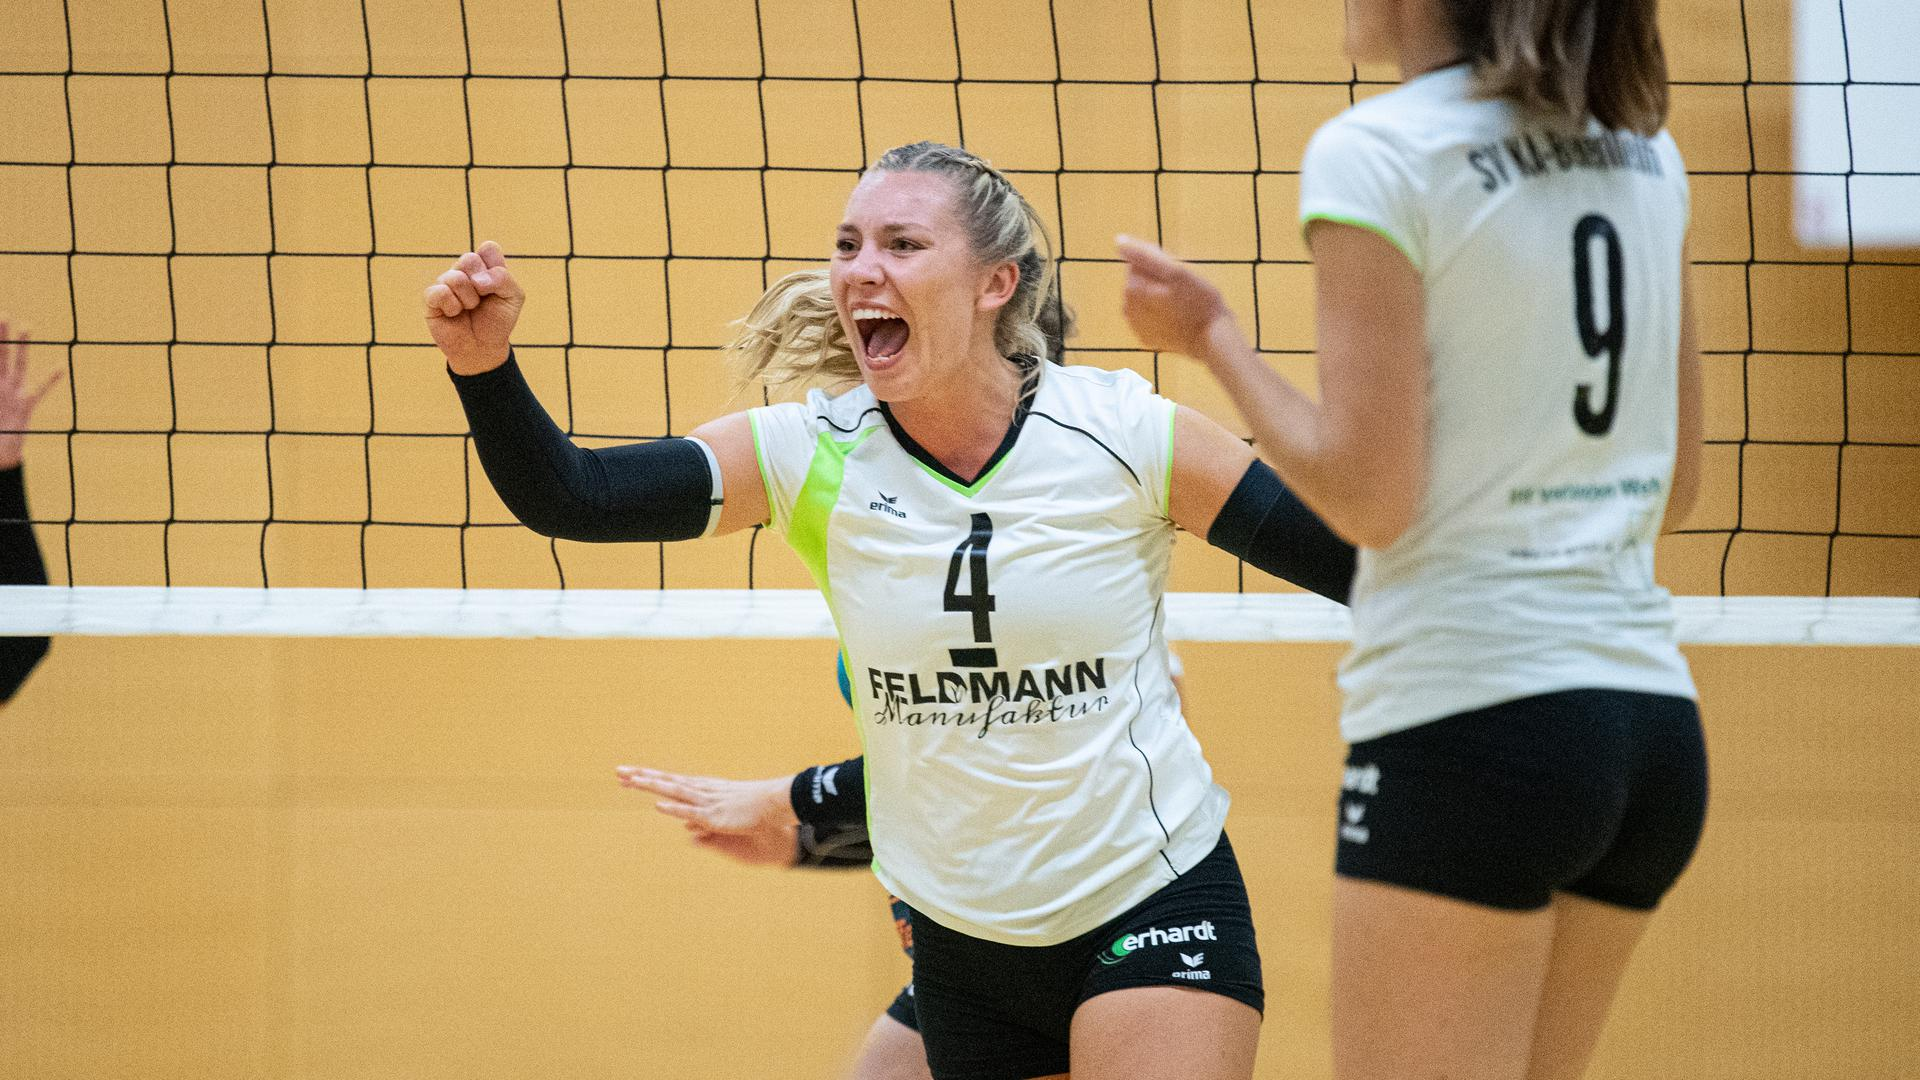 Kathrin Hahn (4/SVK) Jubel.  GES/ Volleyball / Frauen 3.Liga: SV KA-Beiertheim - SSC Freisen, 19.09.2020